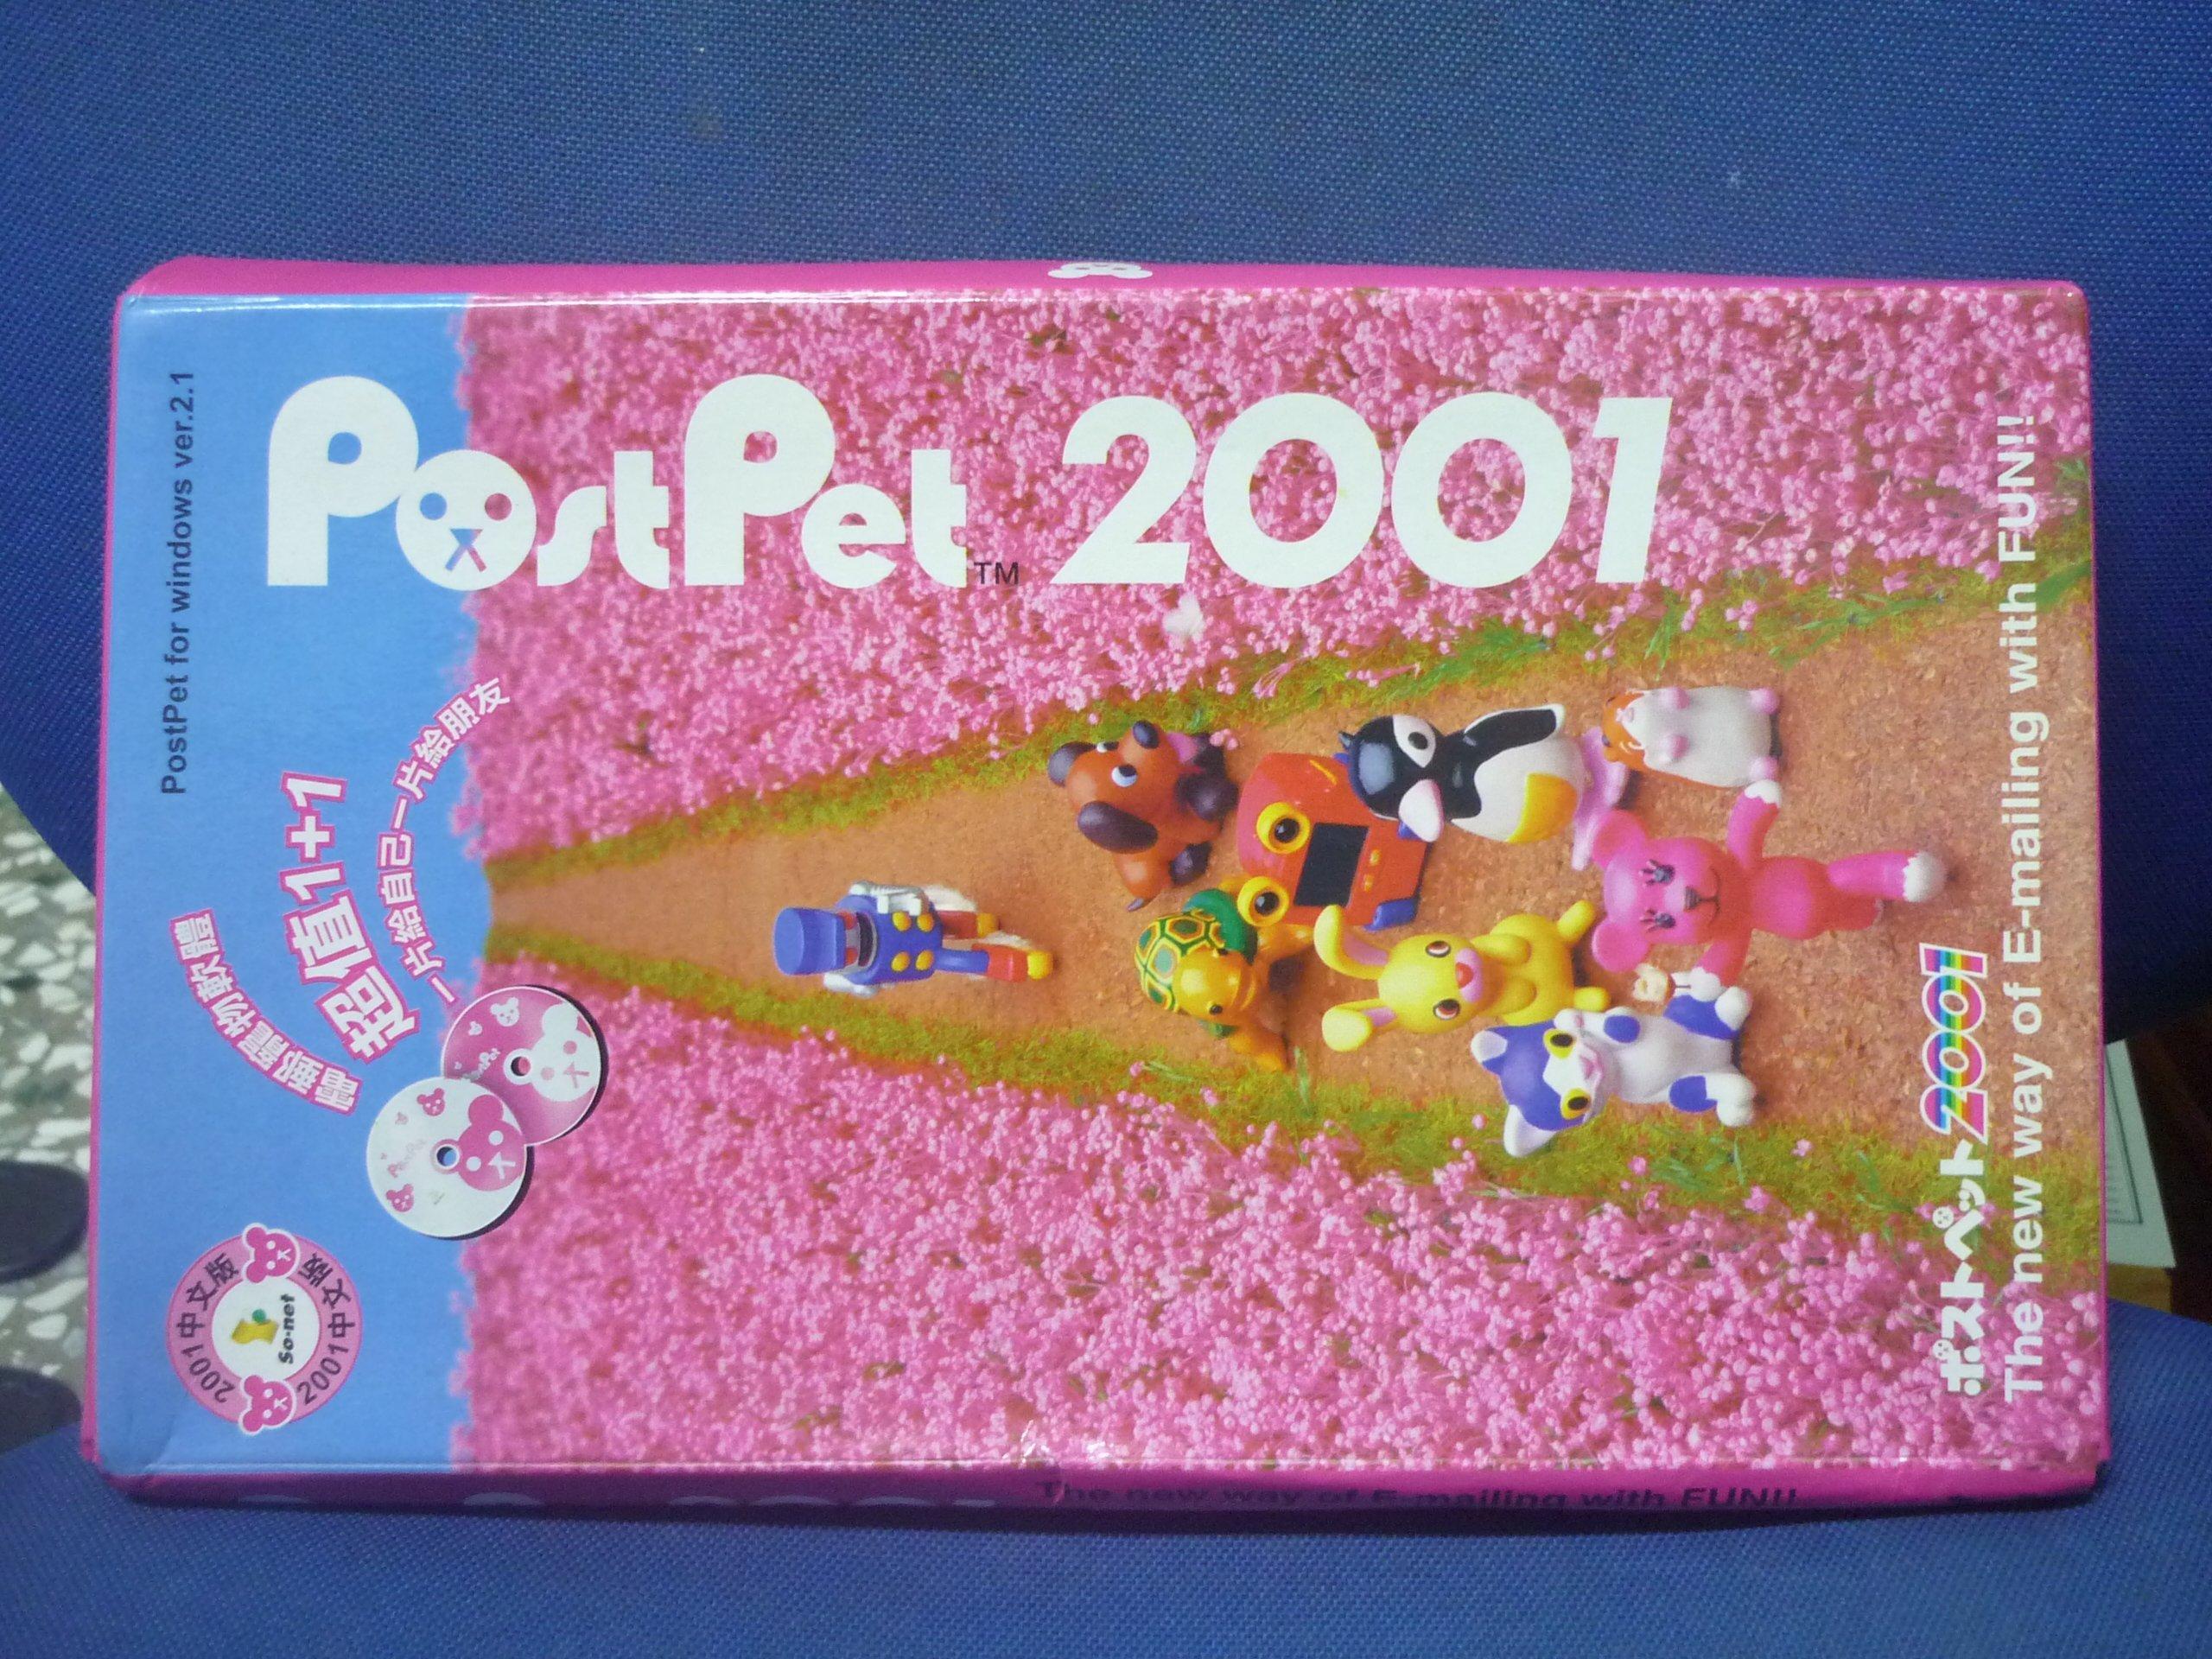 ⛄ [C2區] 收藏書 (絕版) So-net 中文PostPet電郵寵物軟體-二片CD ♛♛